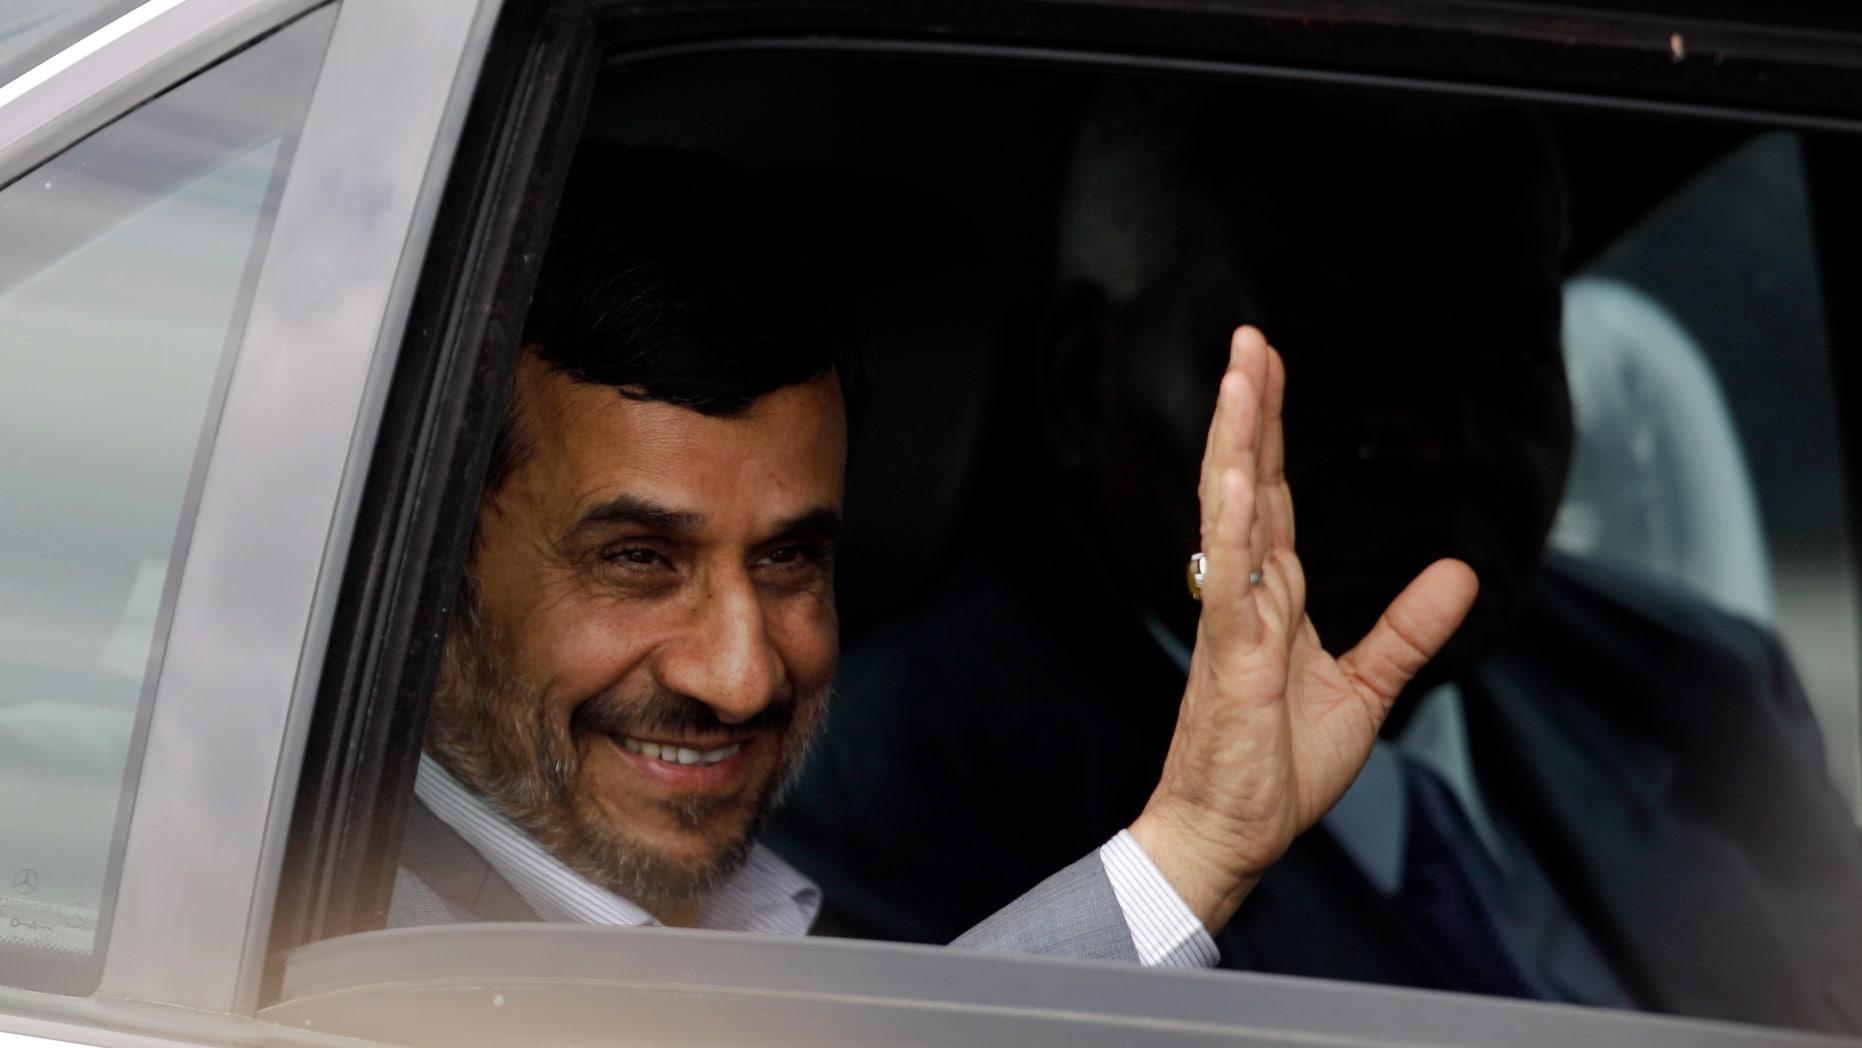 Jan. 11, 2012: Iran's President Mahmoud Ahmadinejad waves from a car after arriving to Jose Marti international airport in Havana, Cuba.